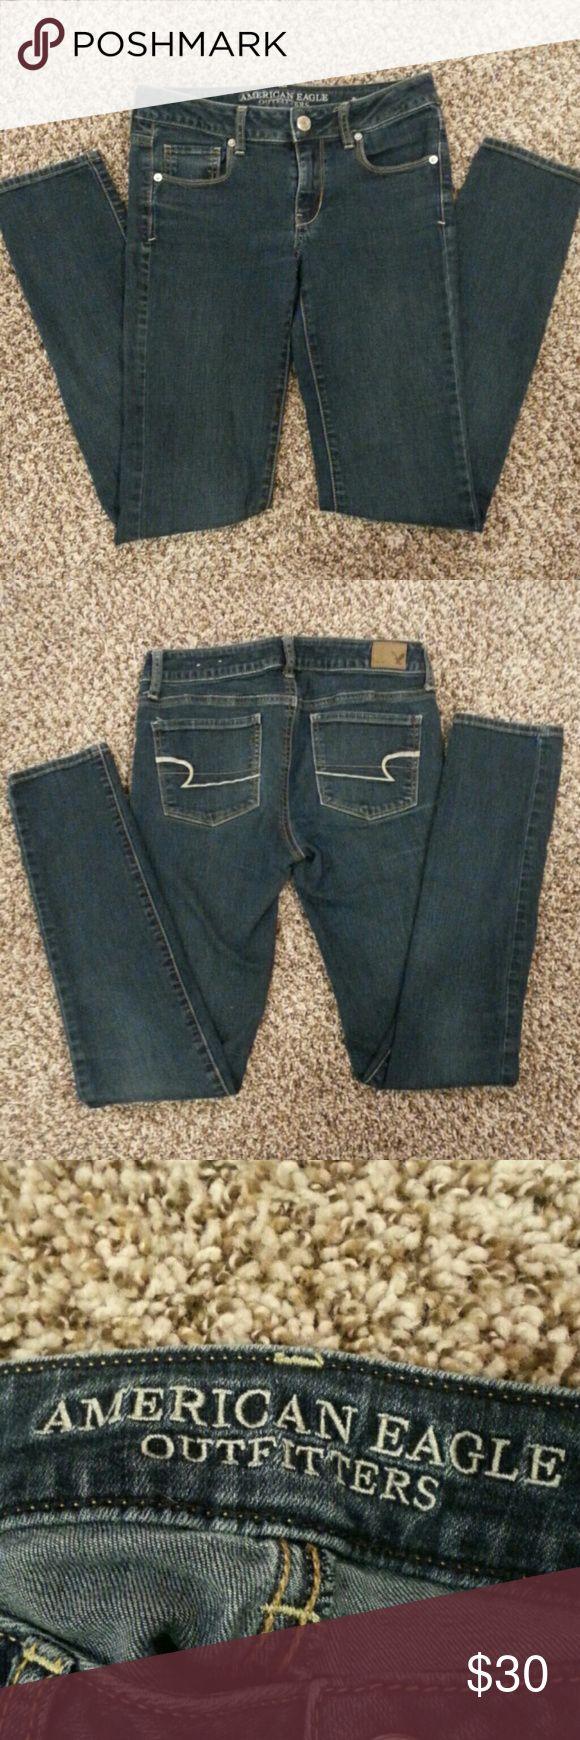 💥SALE💥 American Eagle Denim Skinny Jeans American Eagle Outfitters dark wash skinny jeans. Good condition. American Eagle Outfitters Jeans Skinny